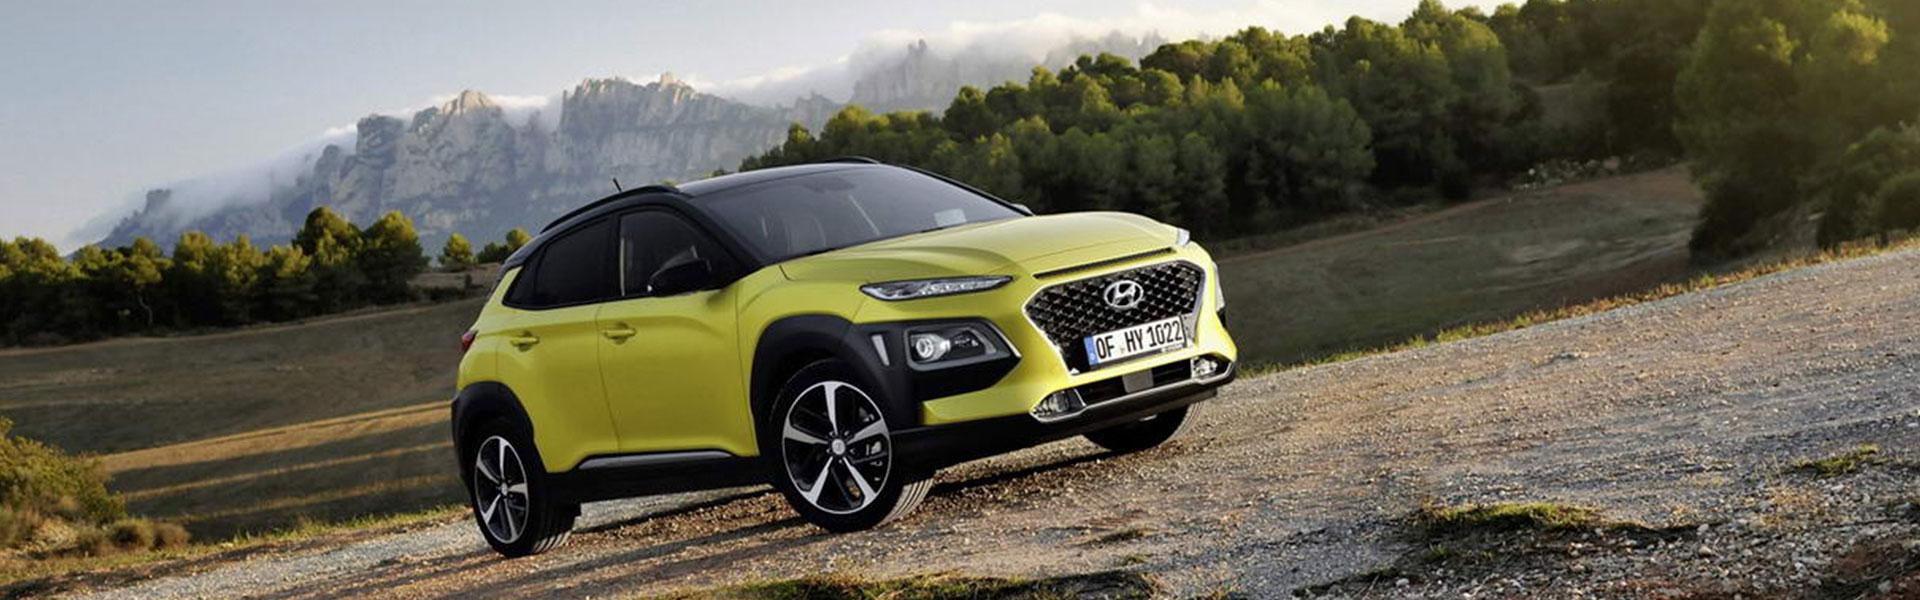 Hyundai Kona - обзор